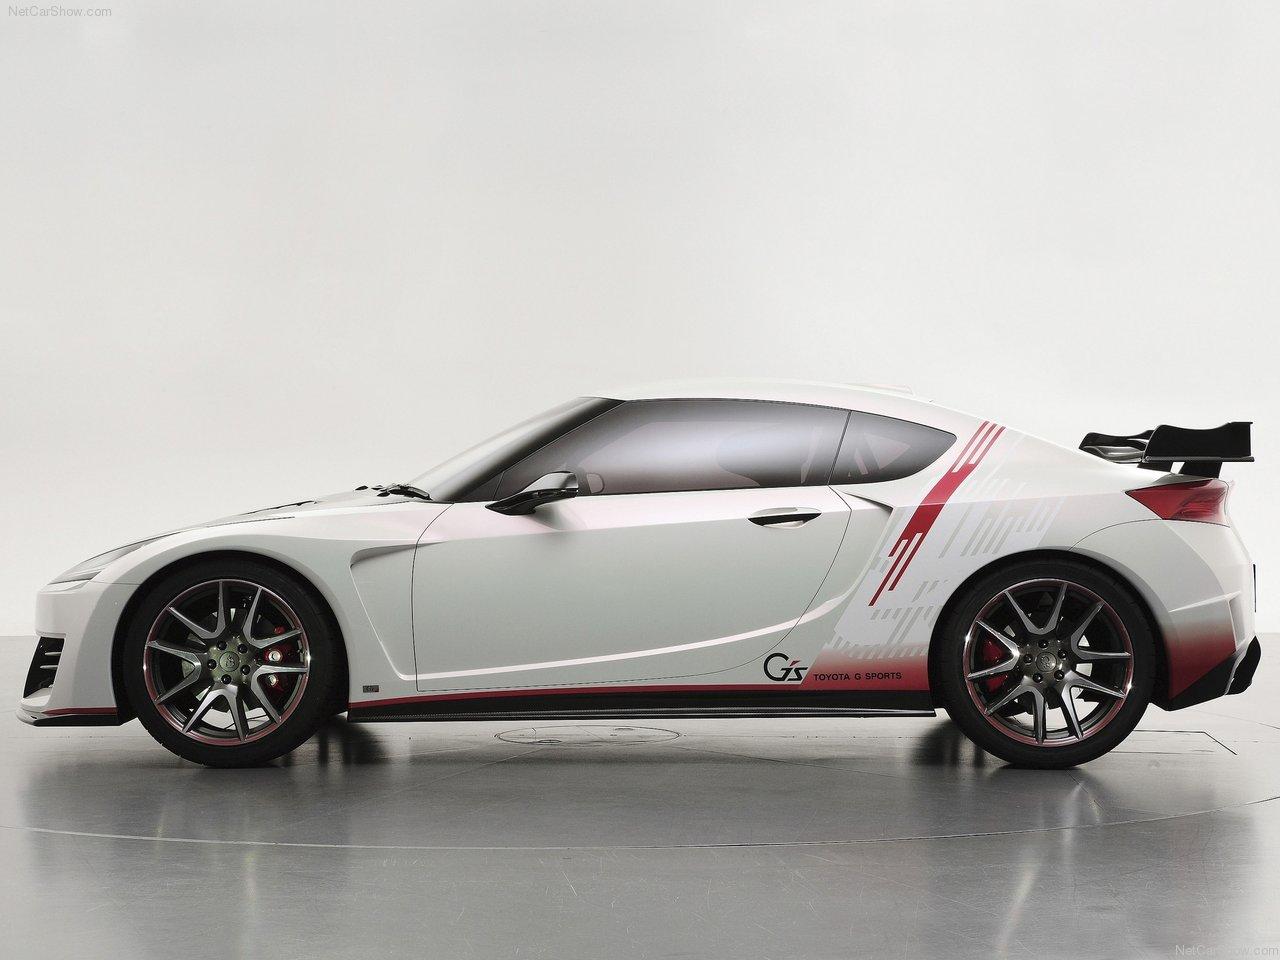 https://4.bp.blogspot.com/_OxQU_AmEgy0/TLPQUNl9VKI/AAAAAAAACMw/TI5leq1JwM8/s1600/Toyota-FT-86G_Sports_Concept_2010_1280x960_wallpaper_06.jpg